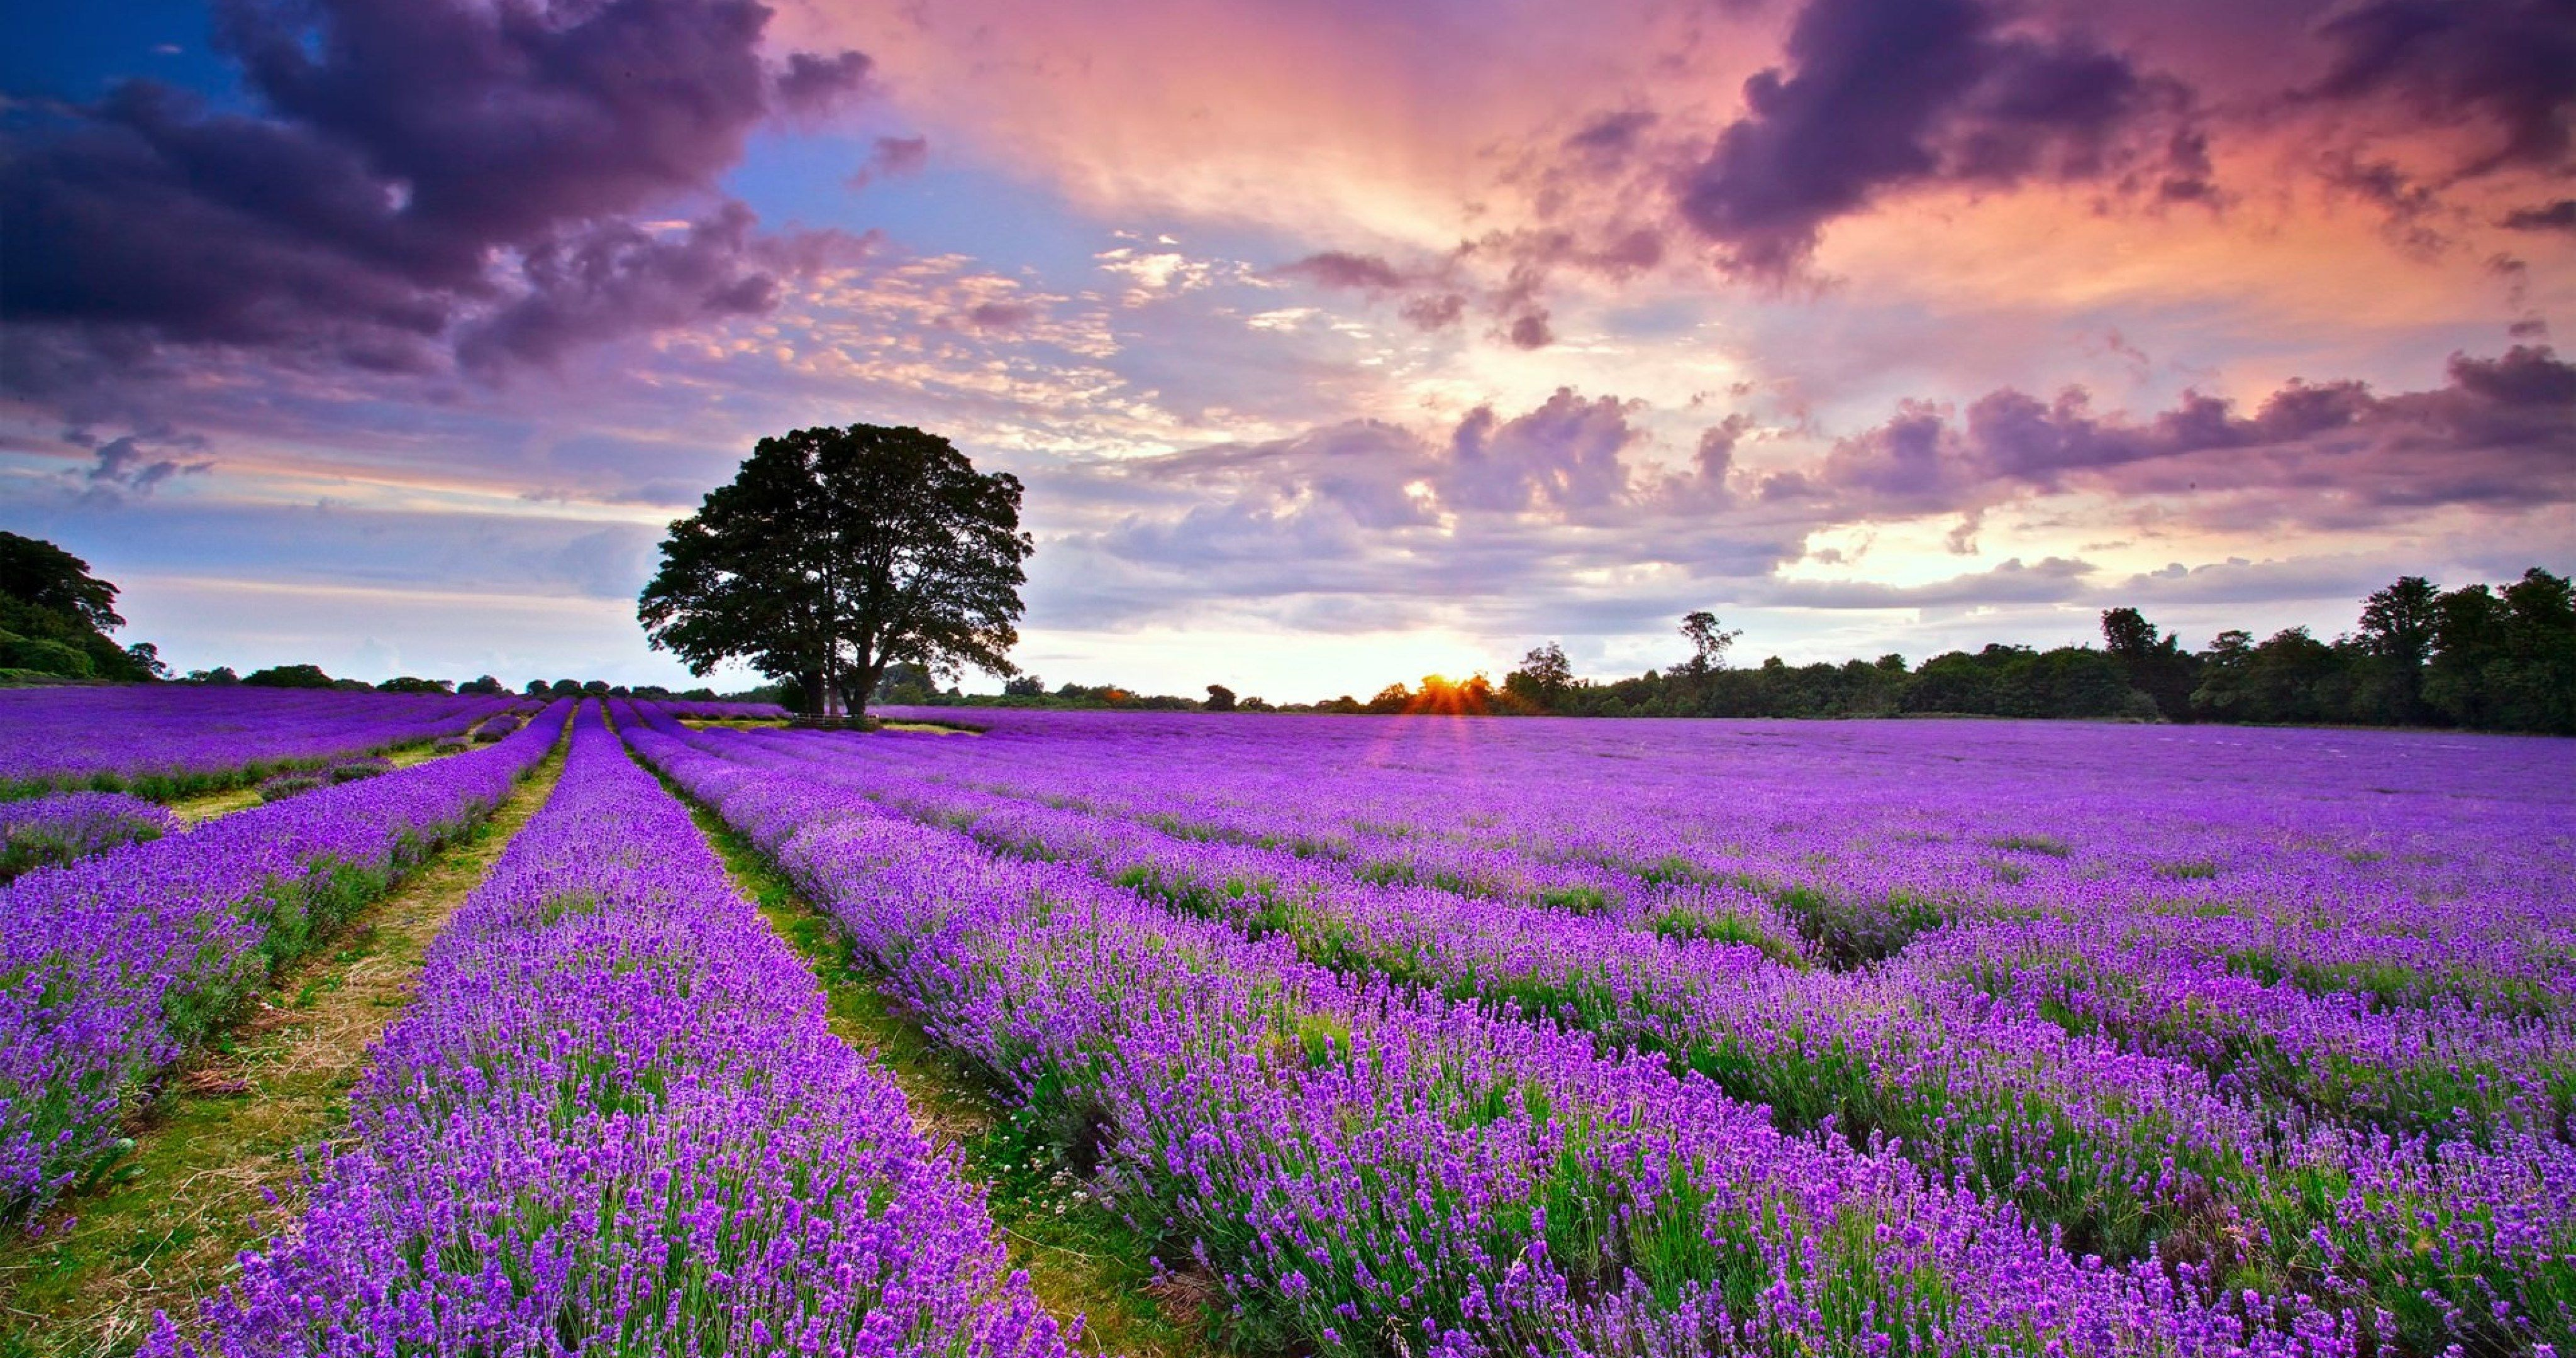 united kingdom lavender field 4k ultra hd wallpaper Wallpaper in 4096x2160